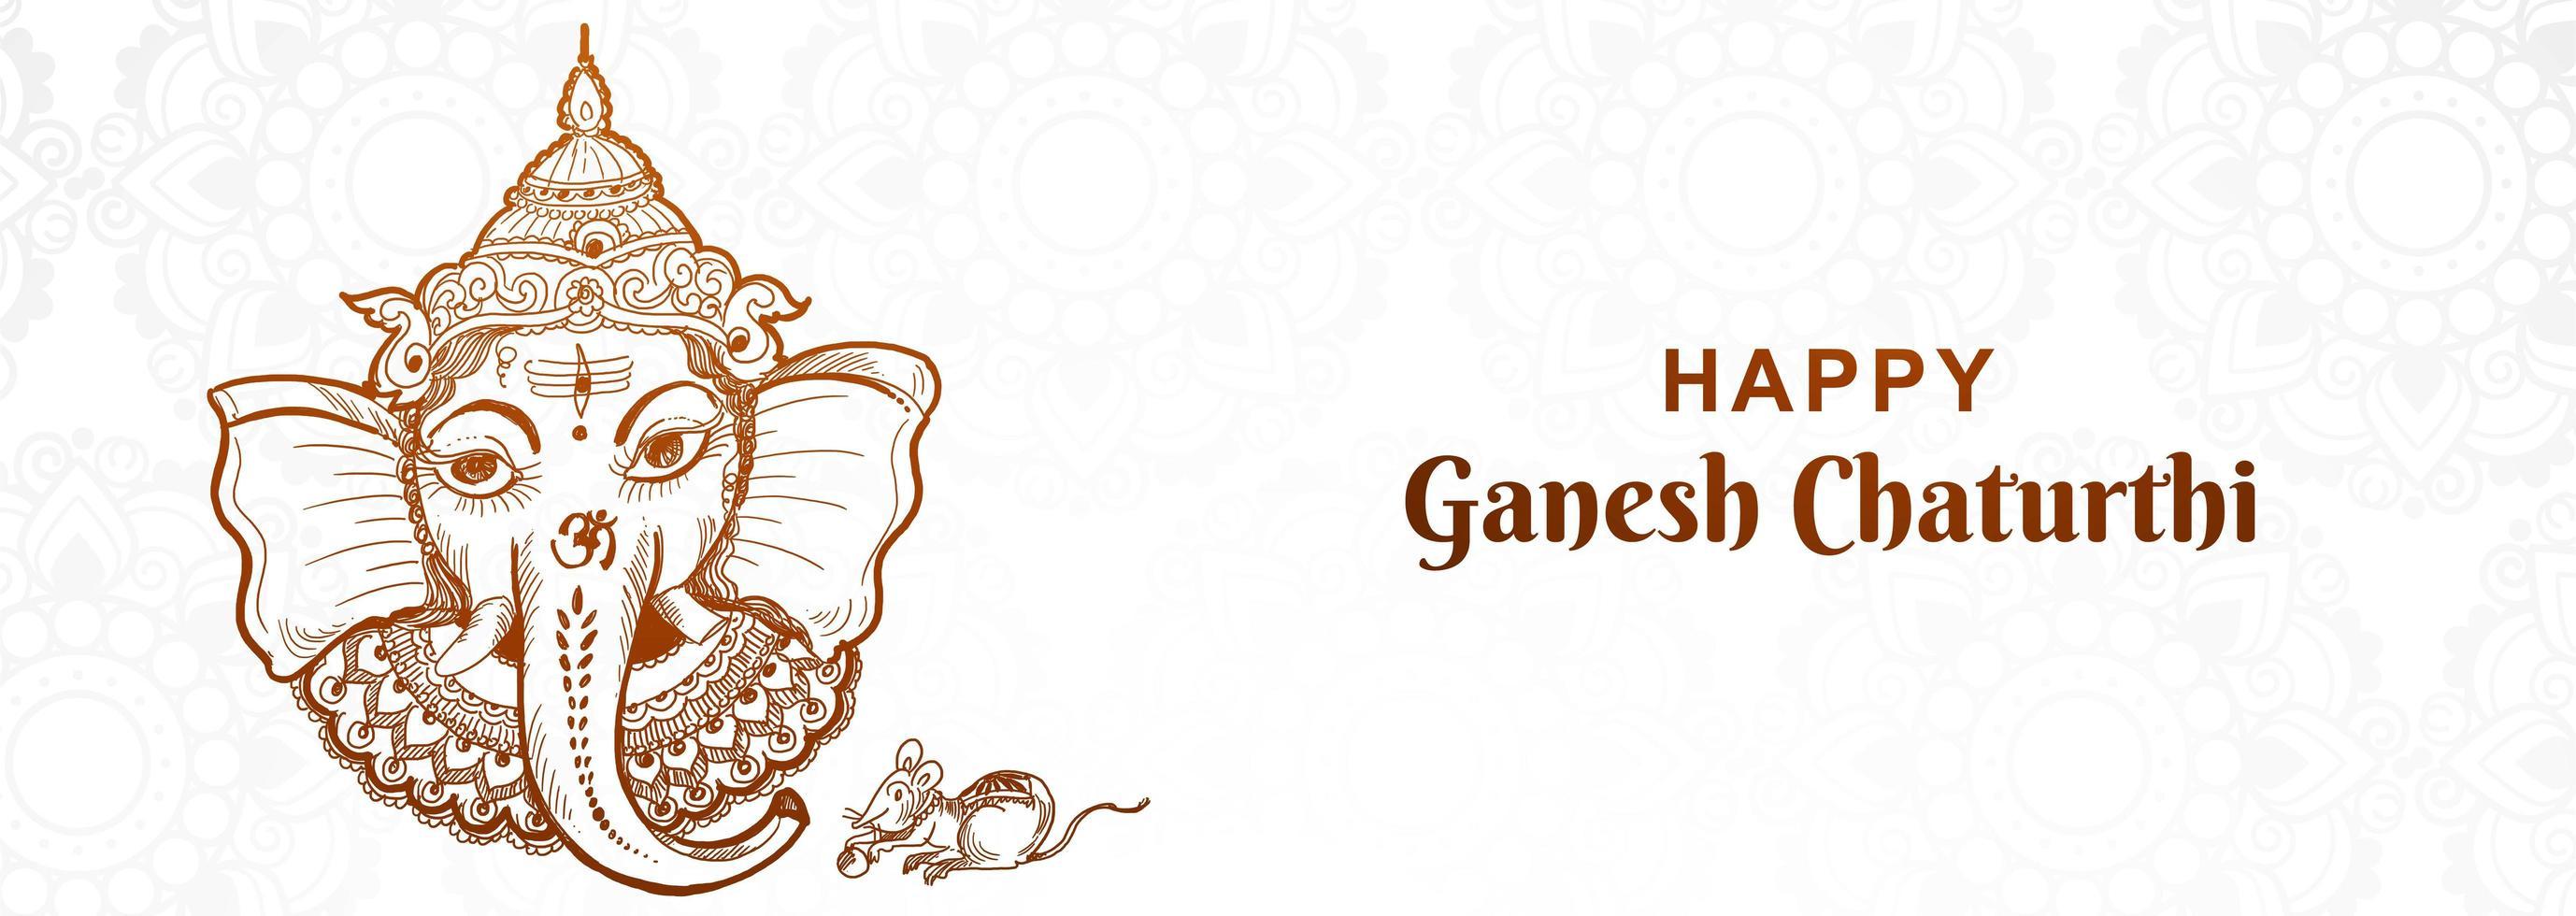 banner artístico do festival ganesh chaturthi vetor